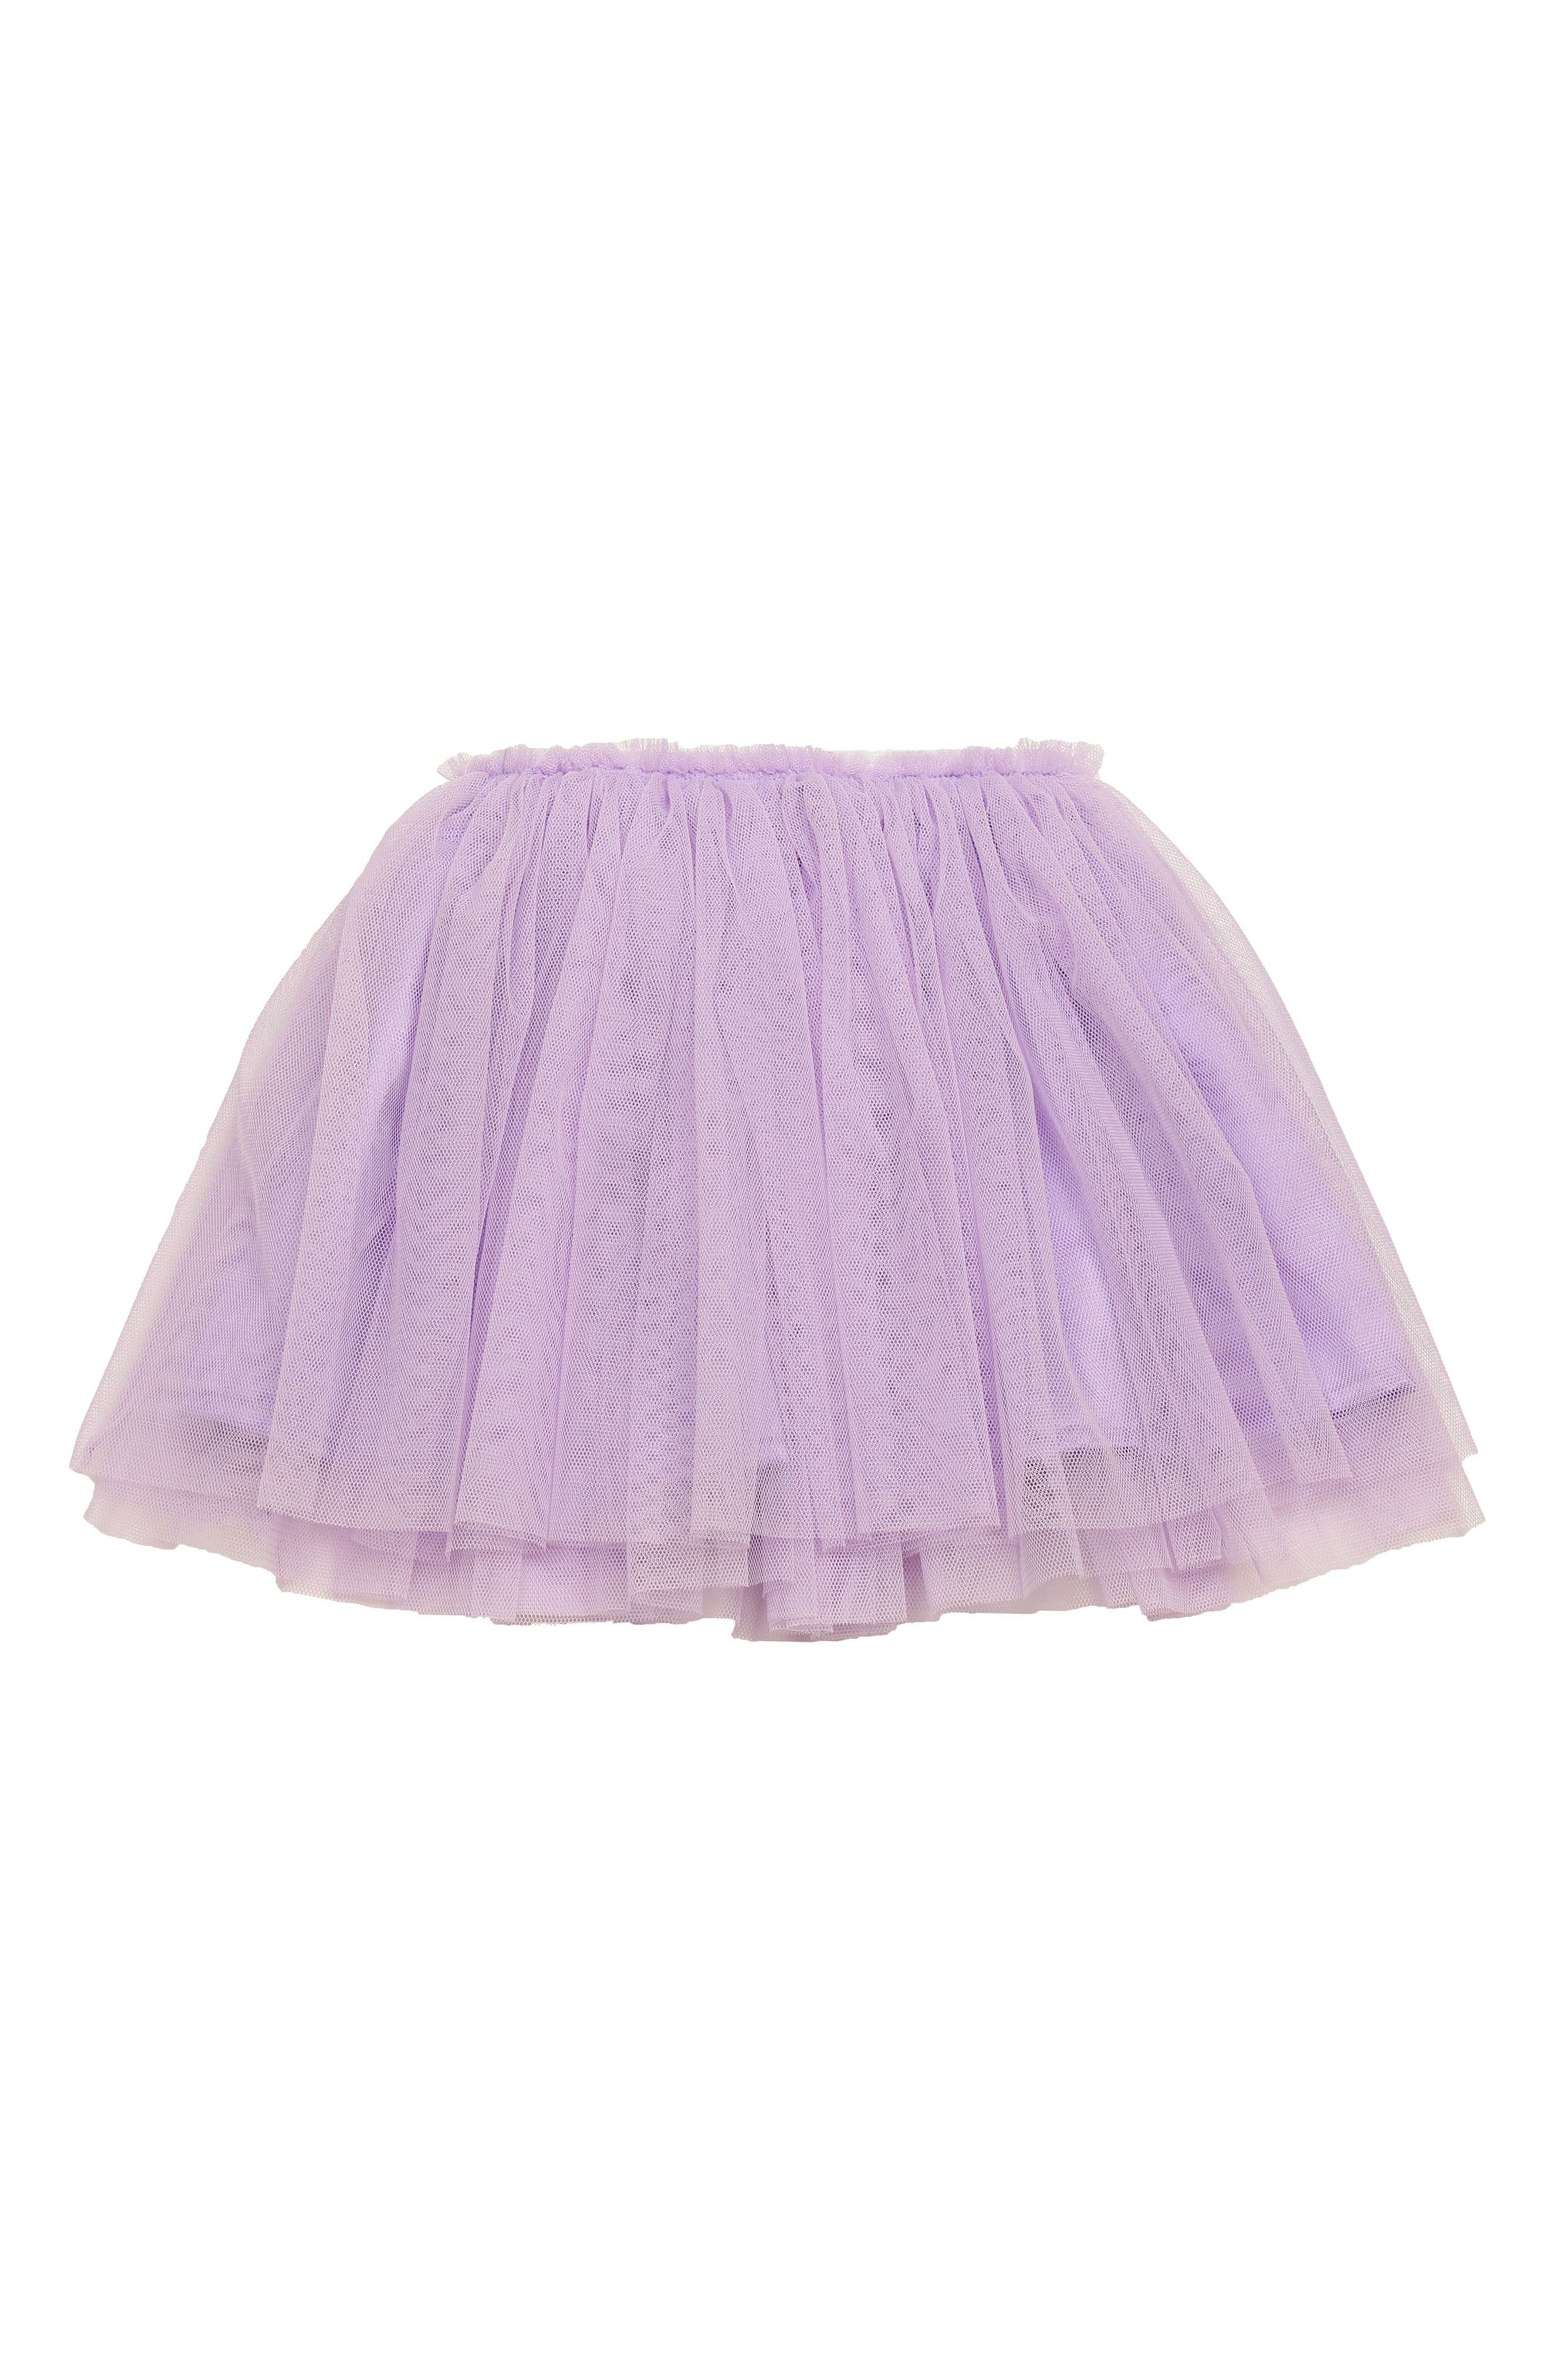 Tutu Skirt,                         Main,                         color, PURPLE